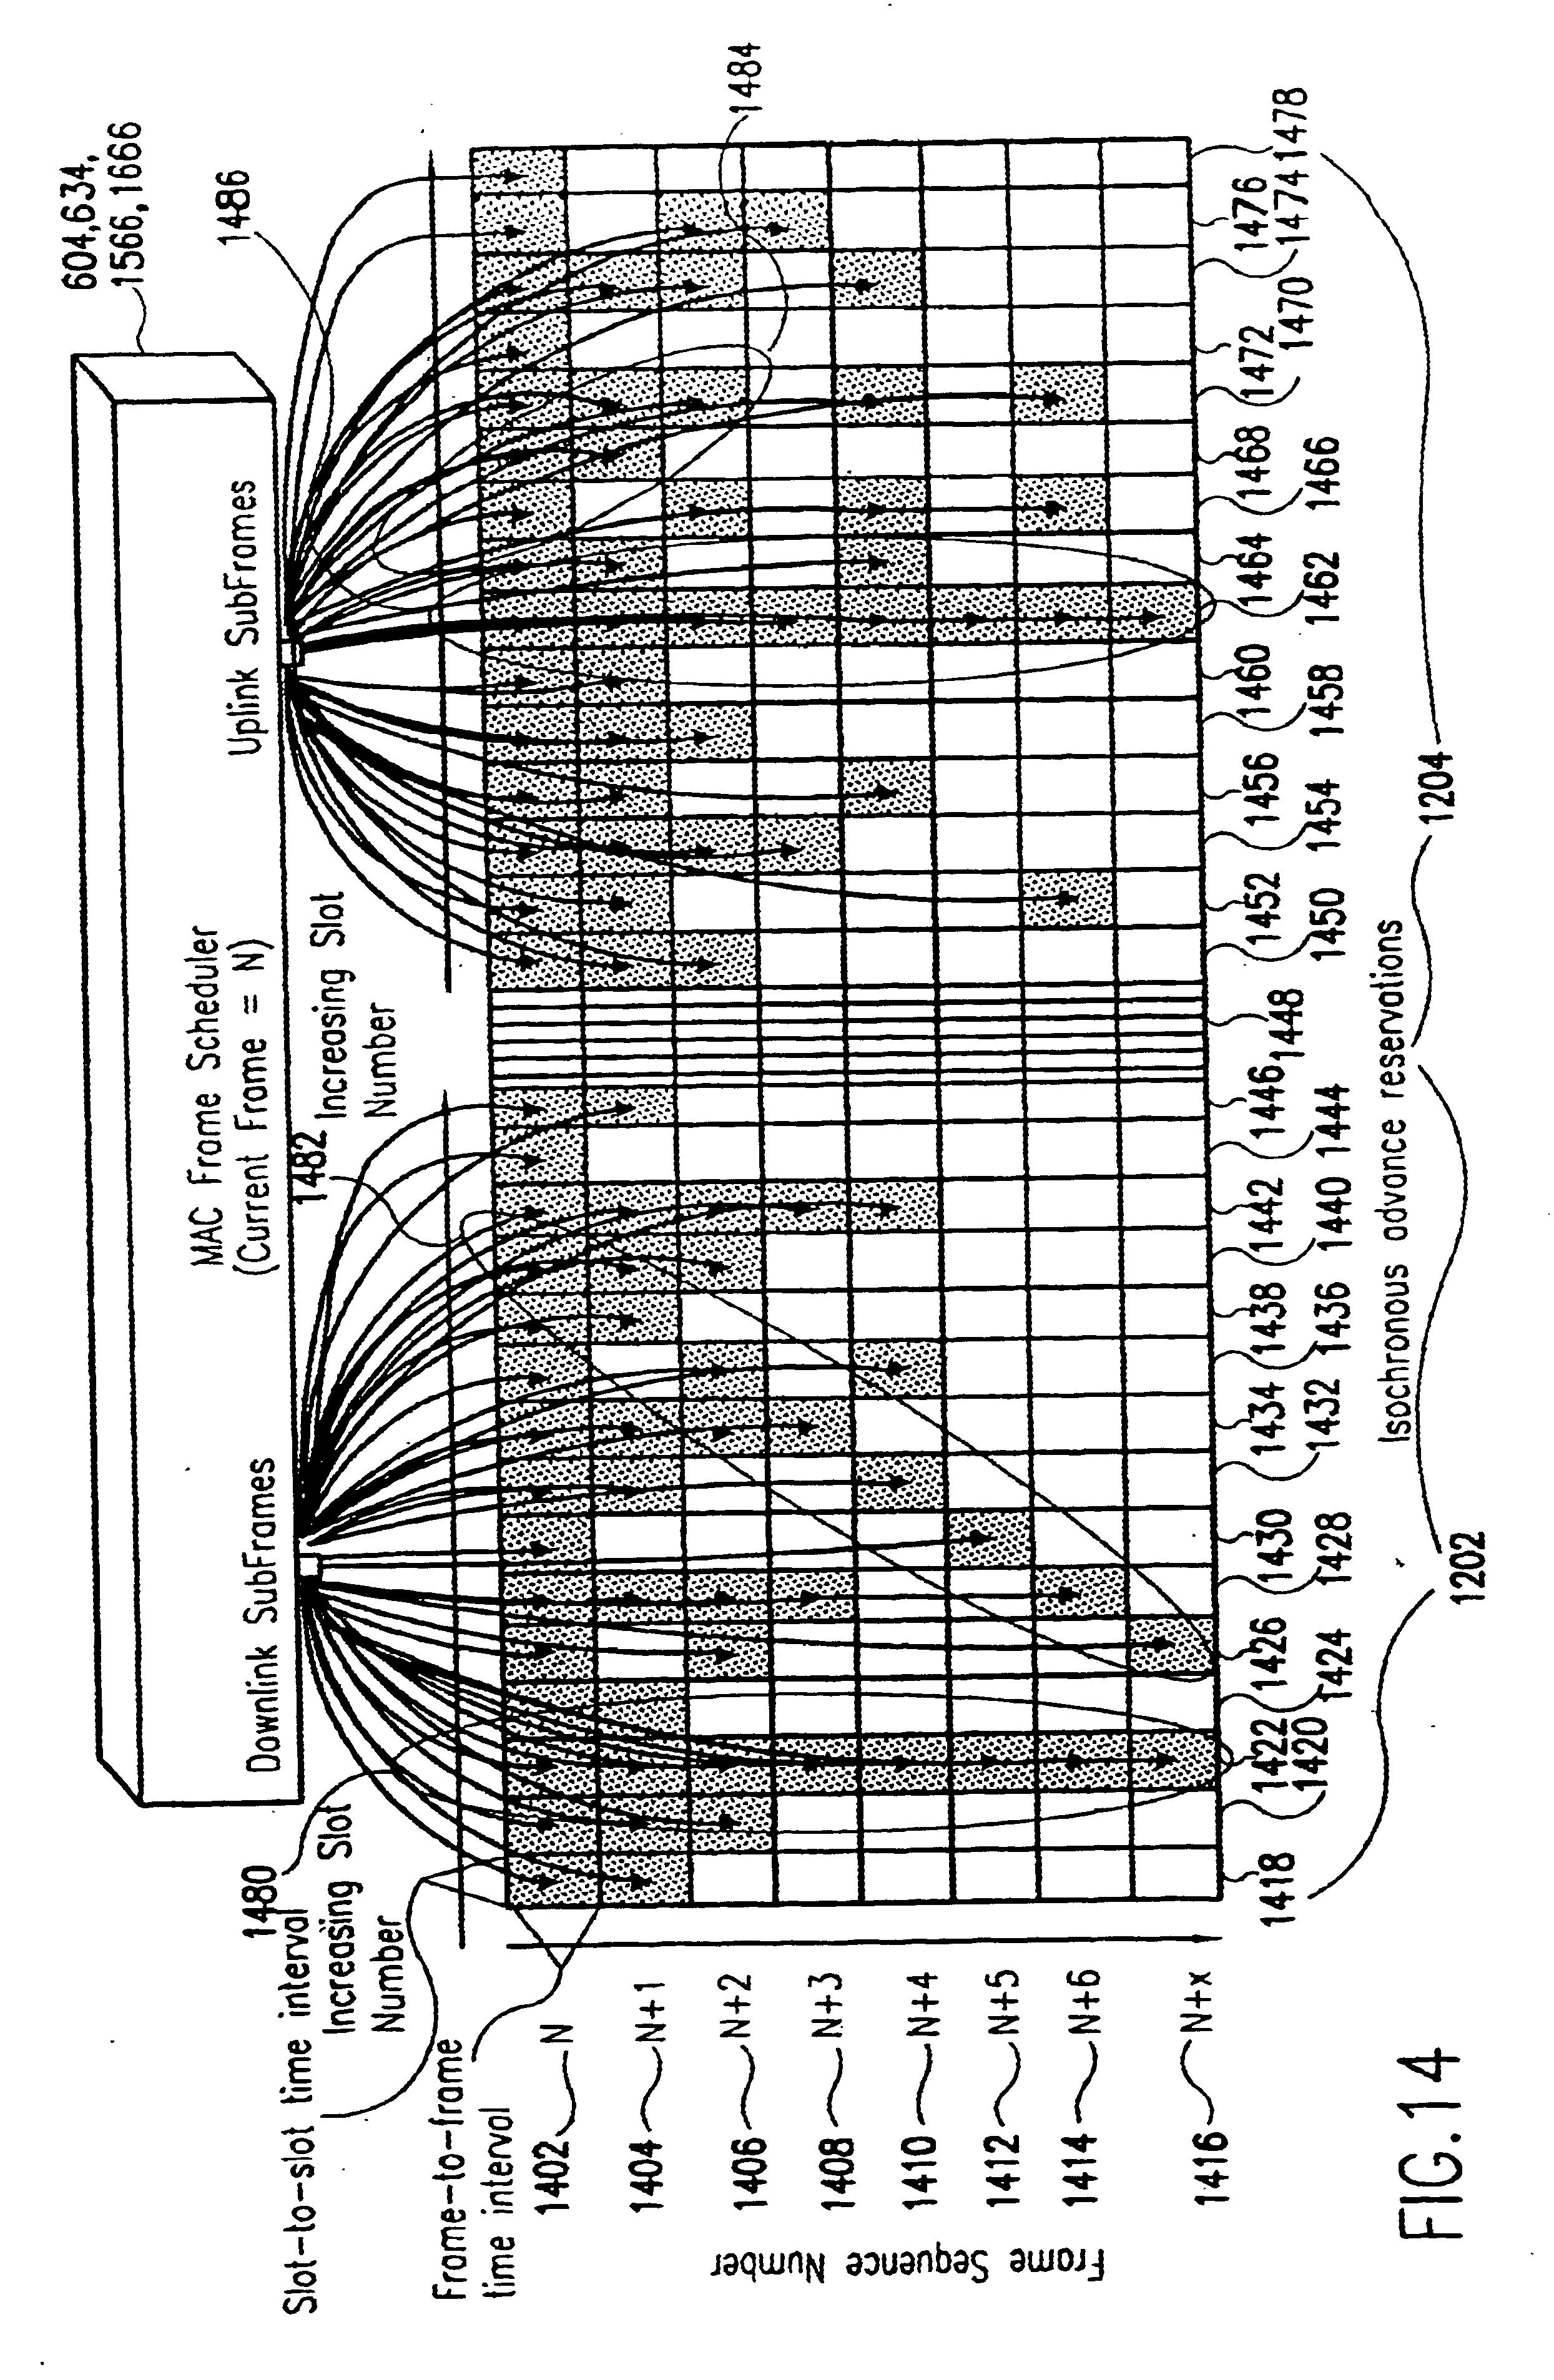 Patent US 6,680,922 B1